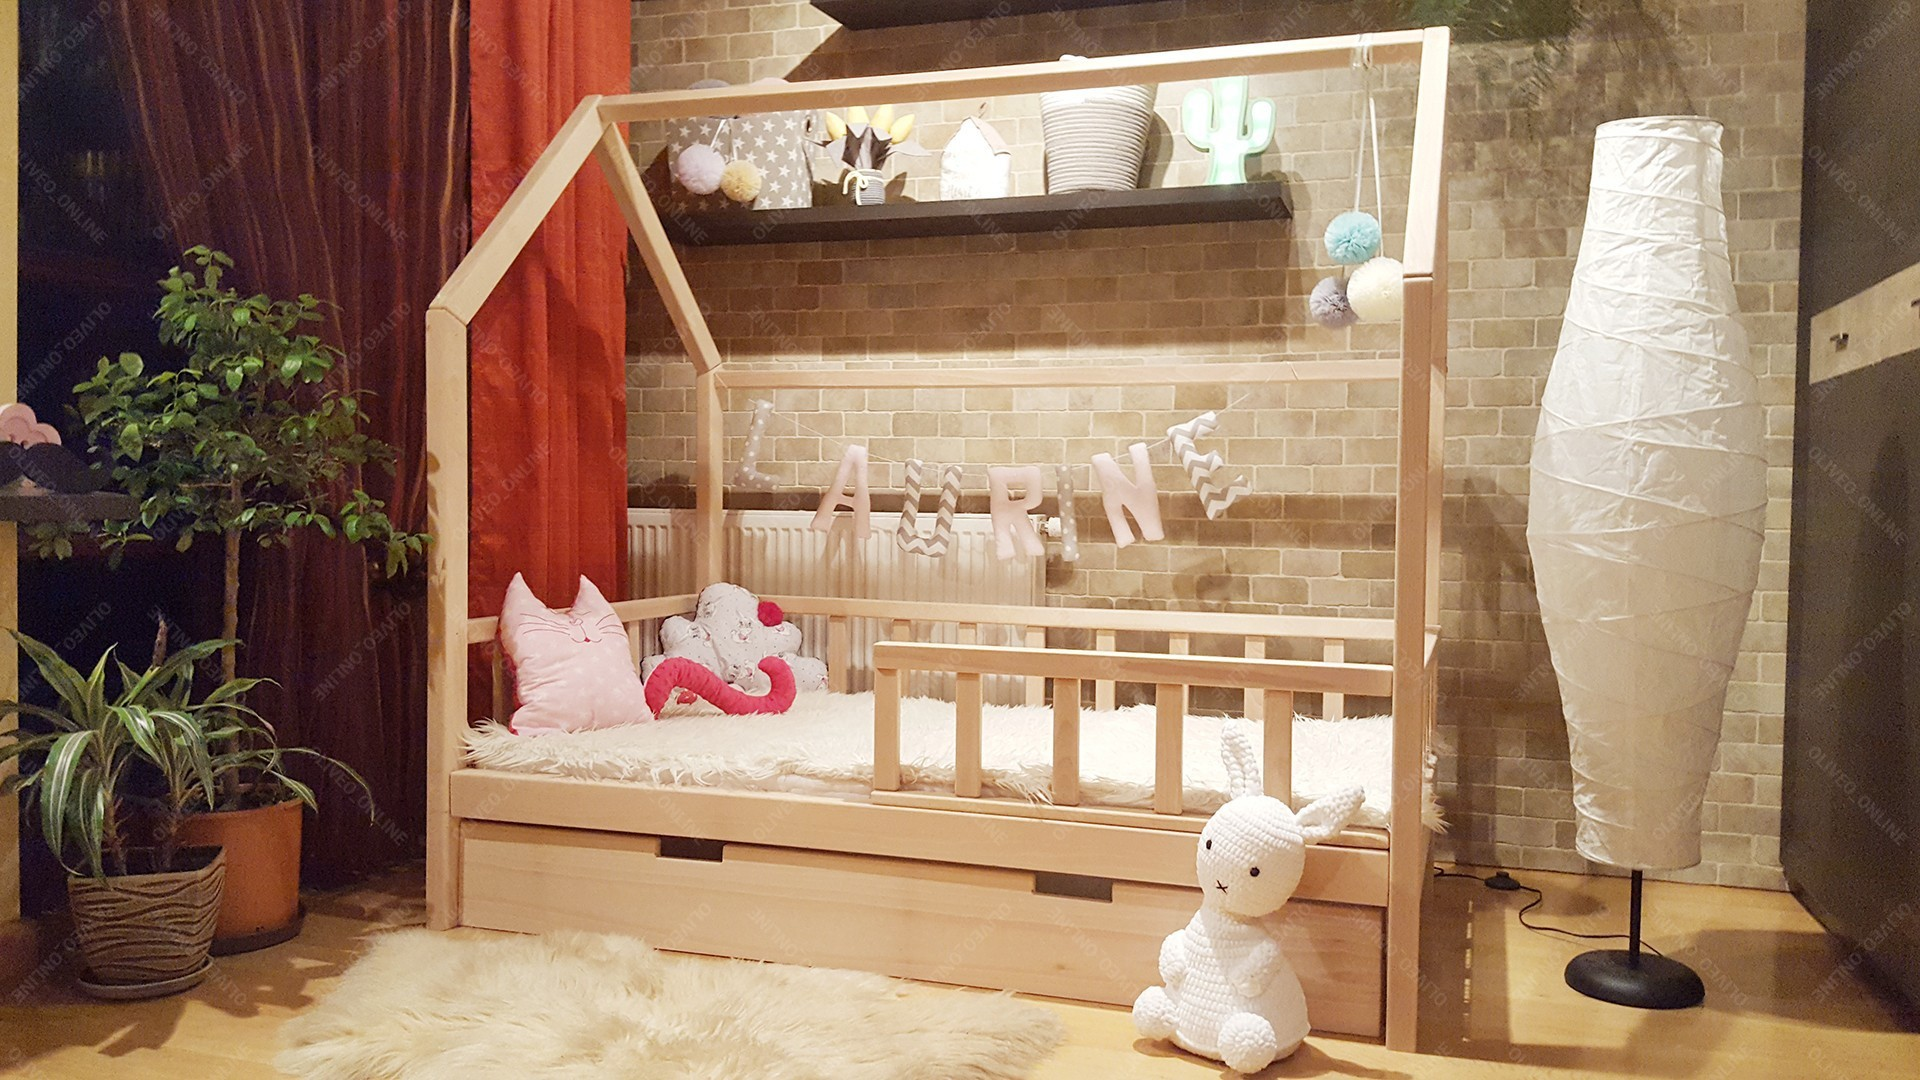 Full Size of Bett Hausbett Buchenholz 100 200cm Hause 100x200 Betten Weiß Wohnzimmer Hausbett 100x200